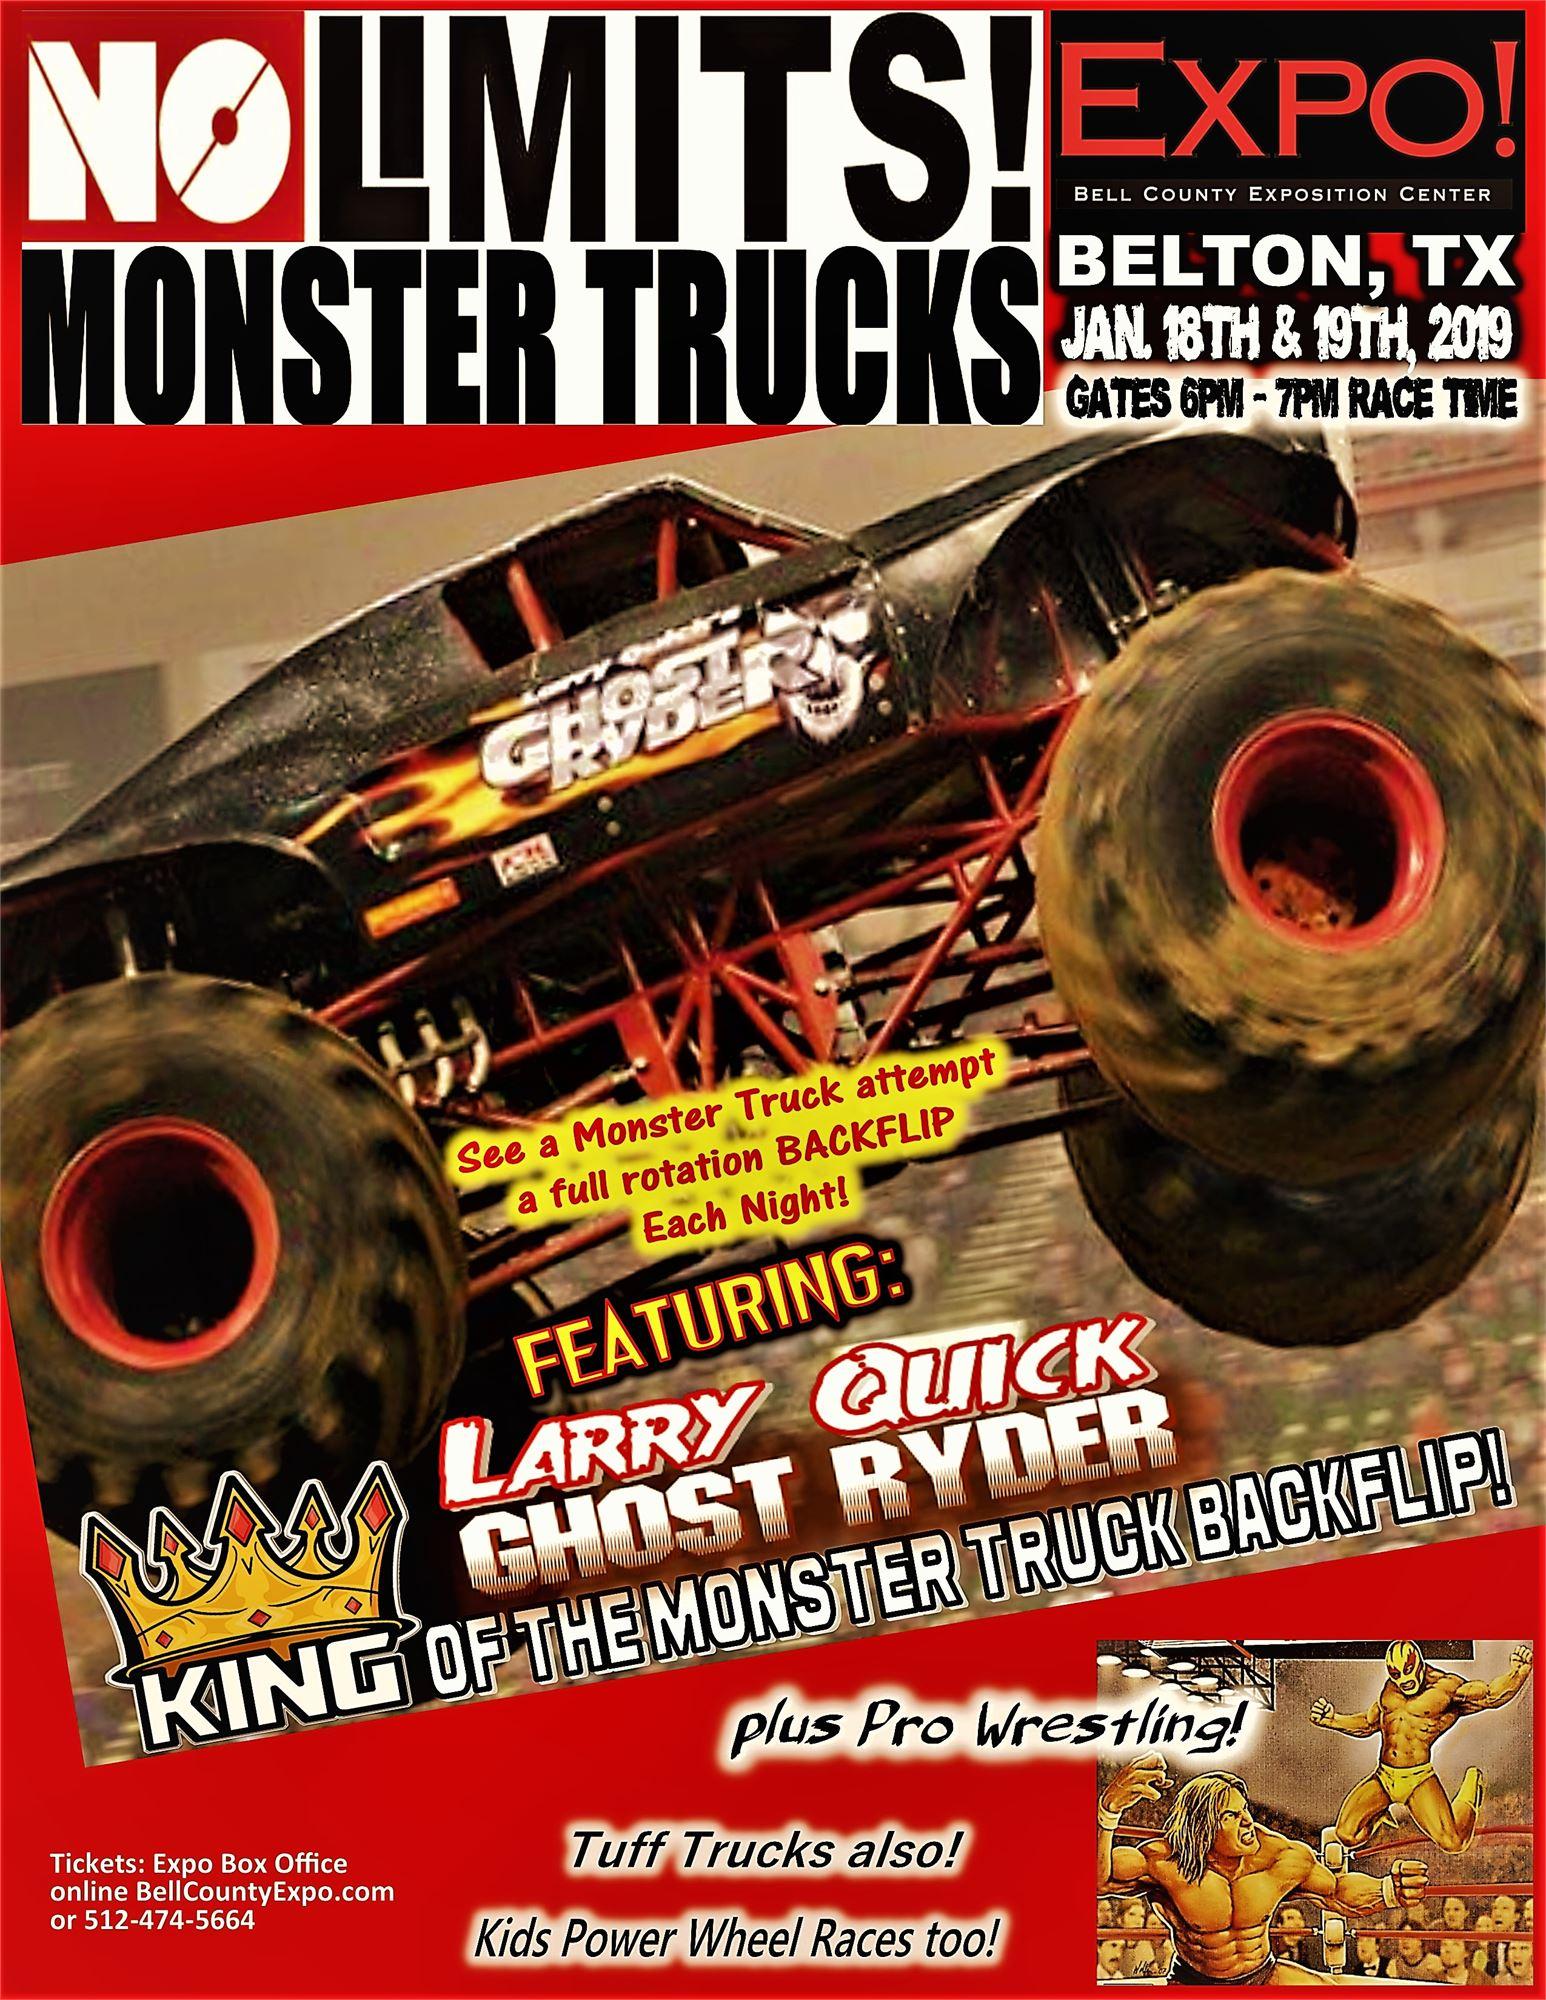 Monster Trucks - Travis county expo center car show